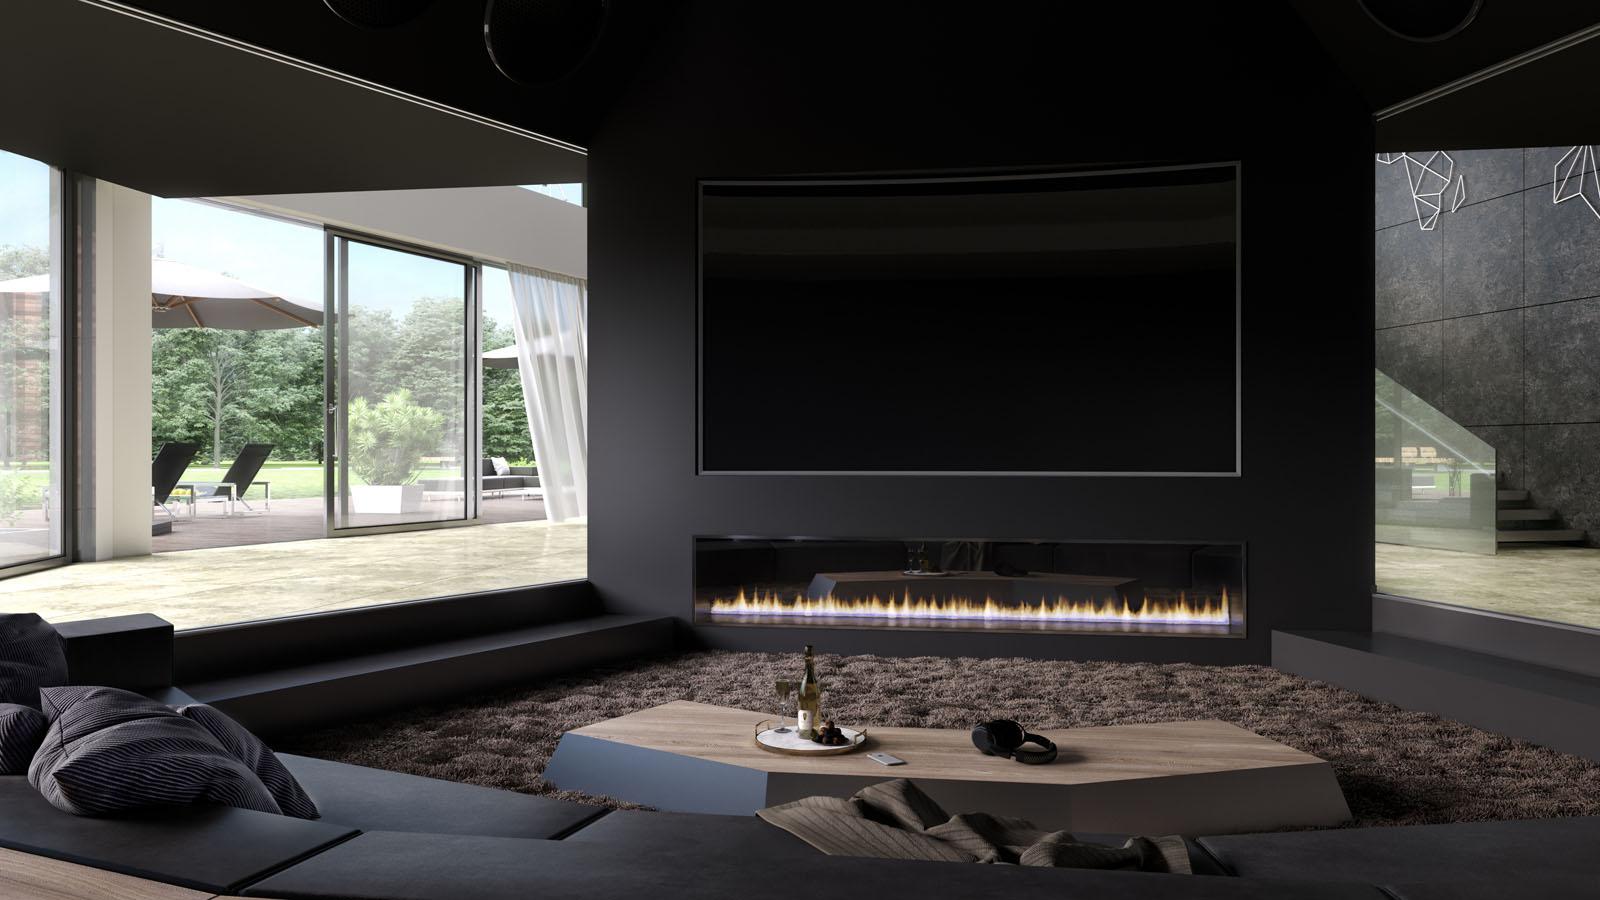 Luxe Interieur Design : D interieur ontwerpvisualisatie luxe woning choro